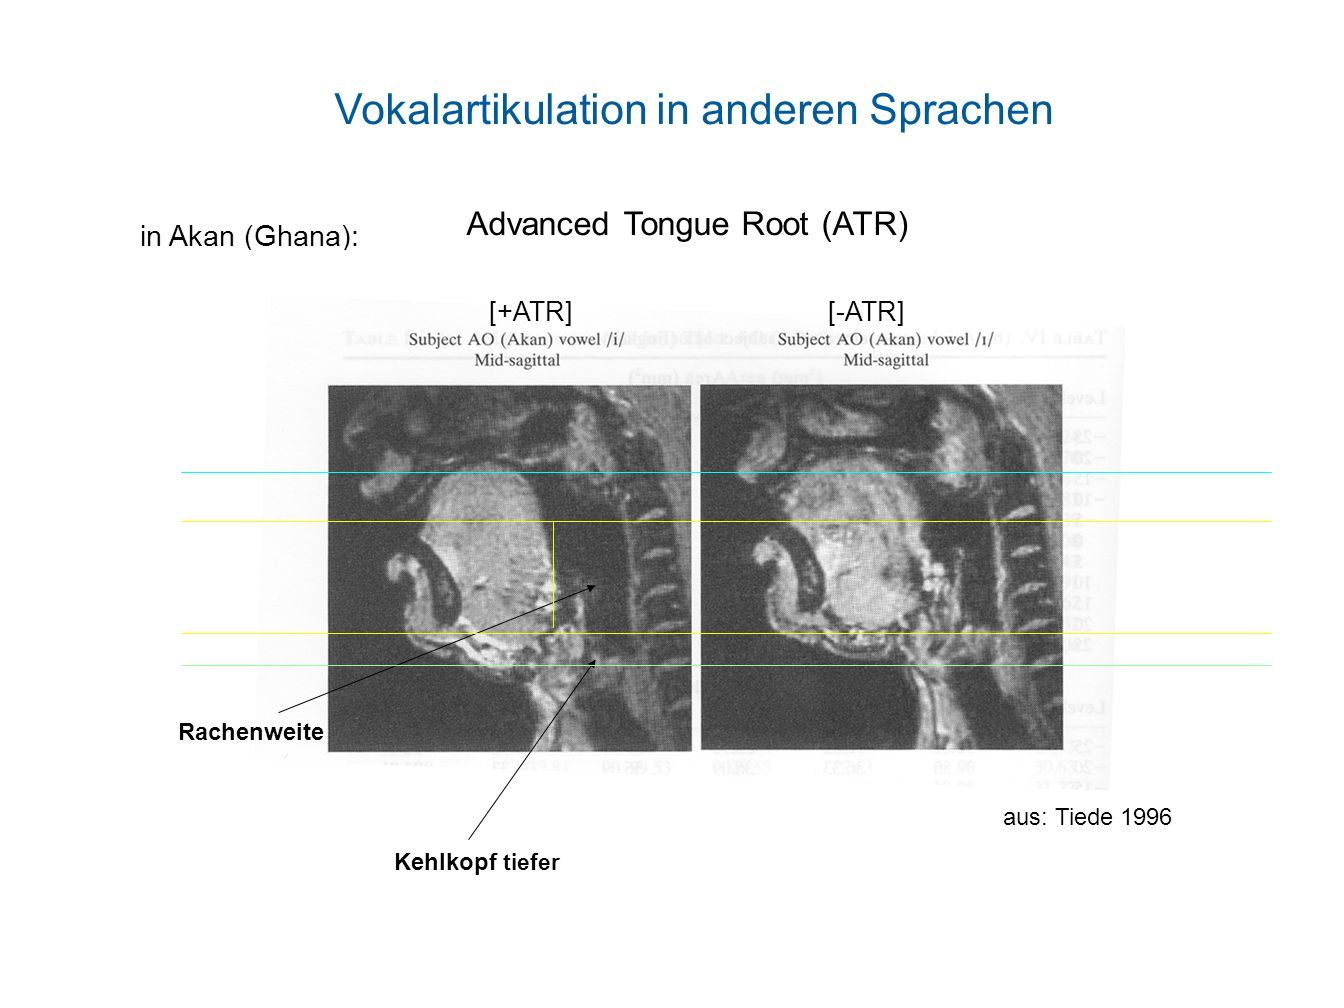 Vokalartikulation in anderen Sprachen